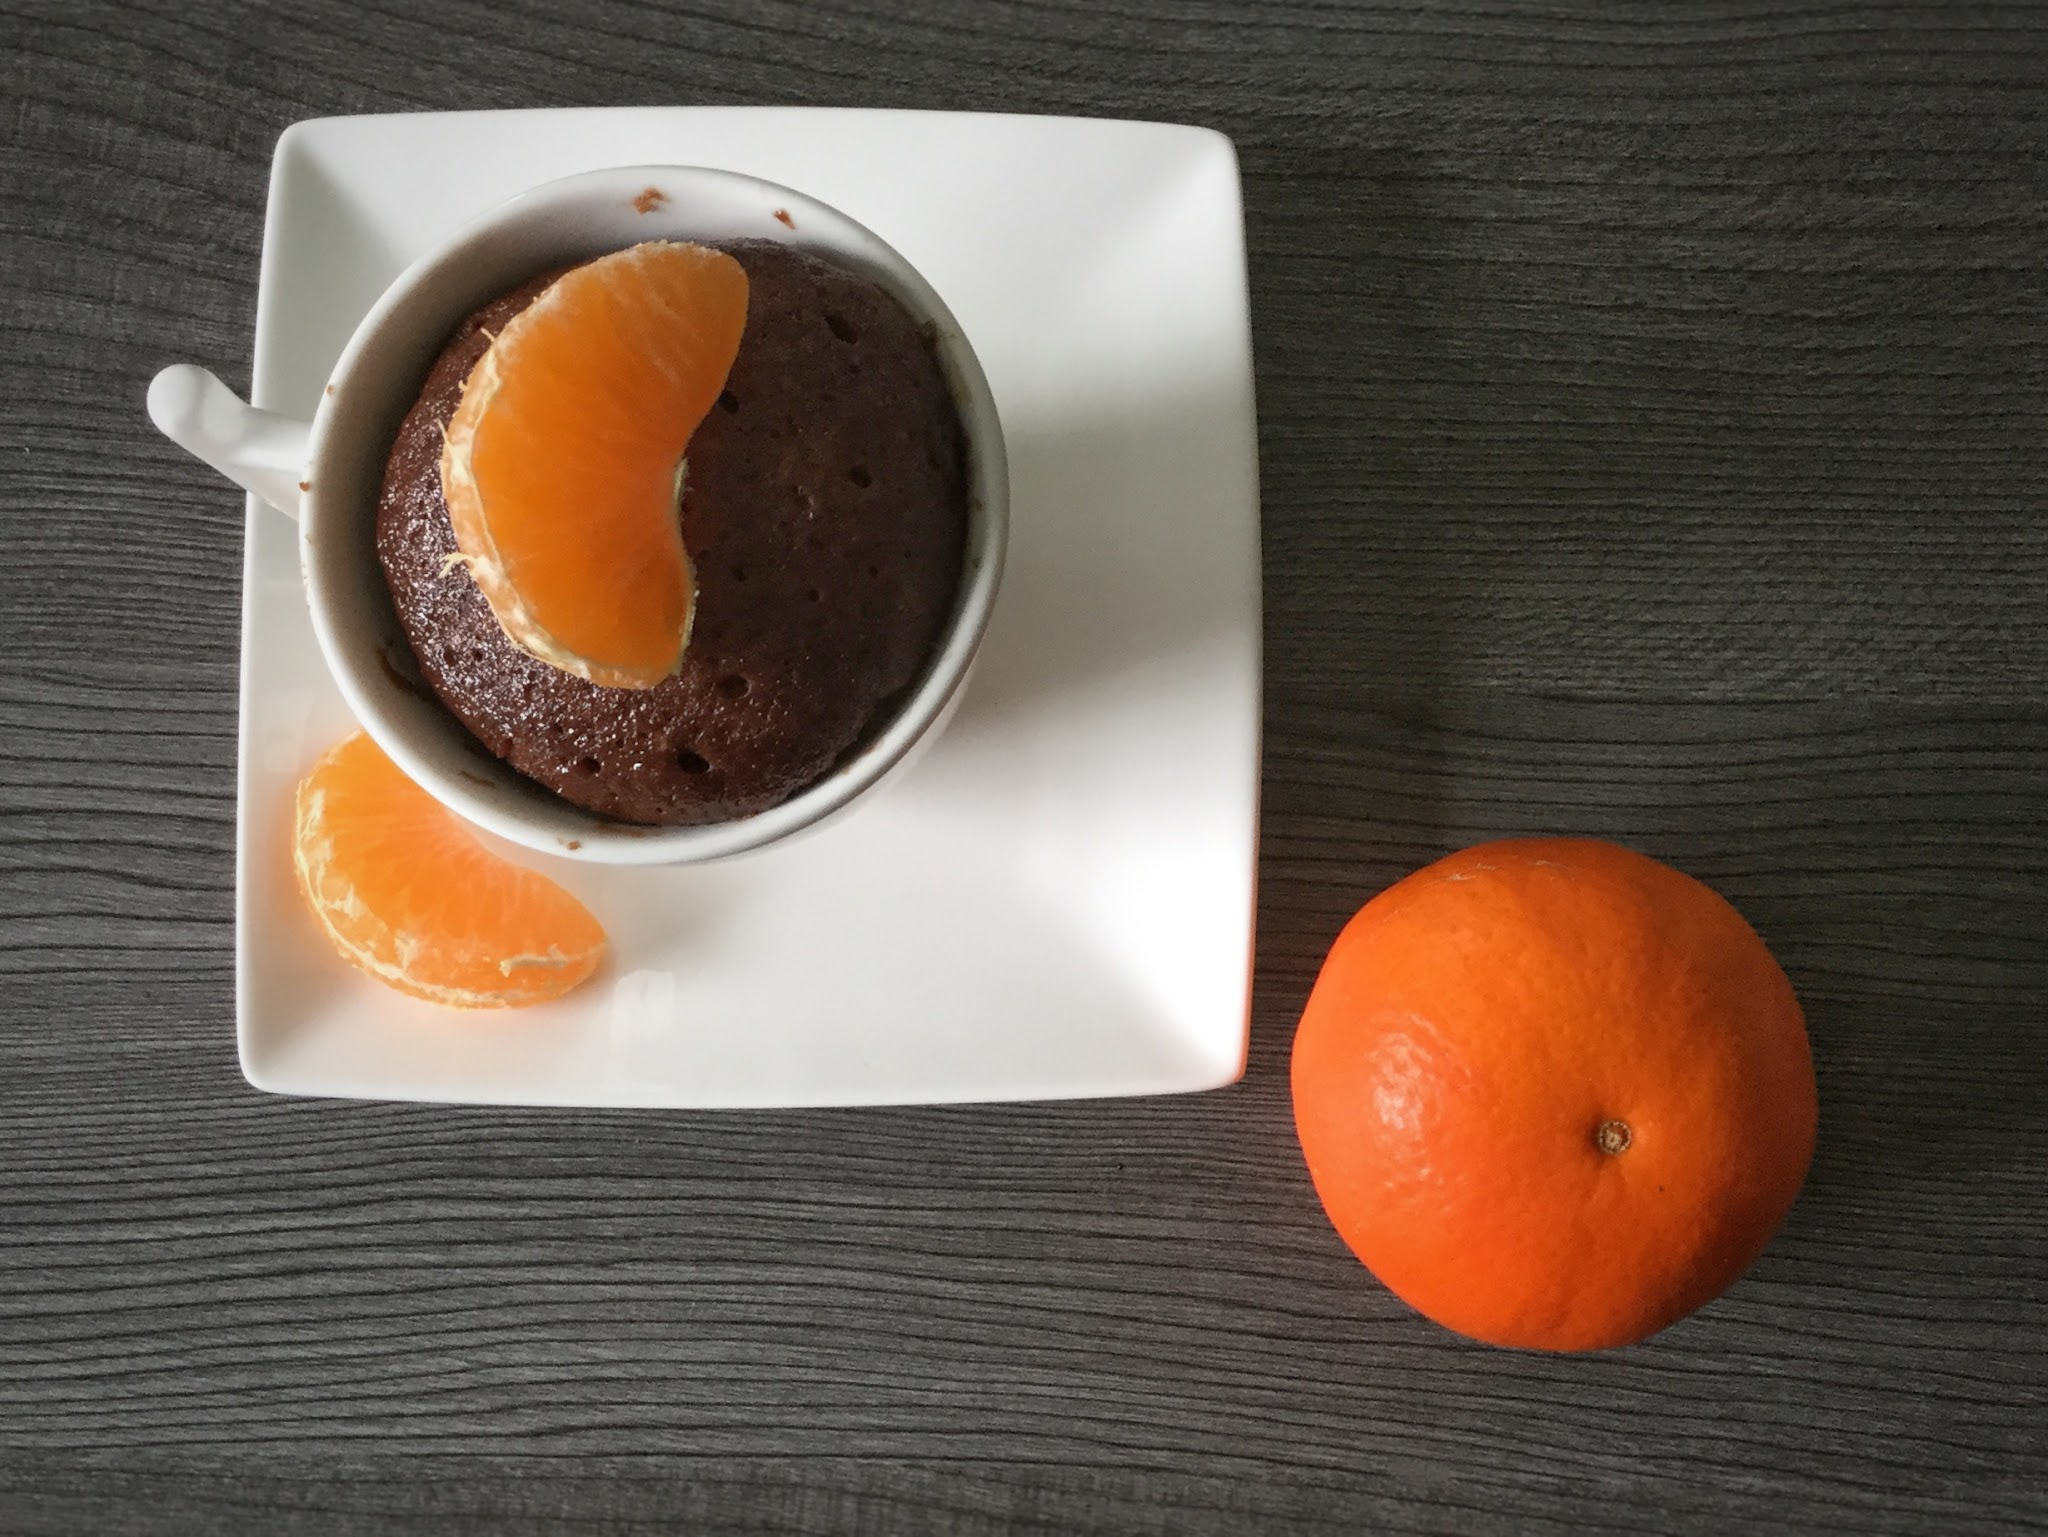 defi-culinaire-passe-plat-agrume-6